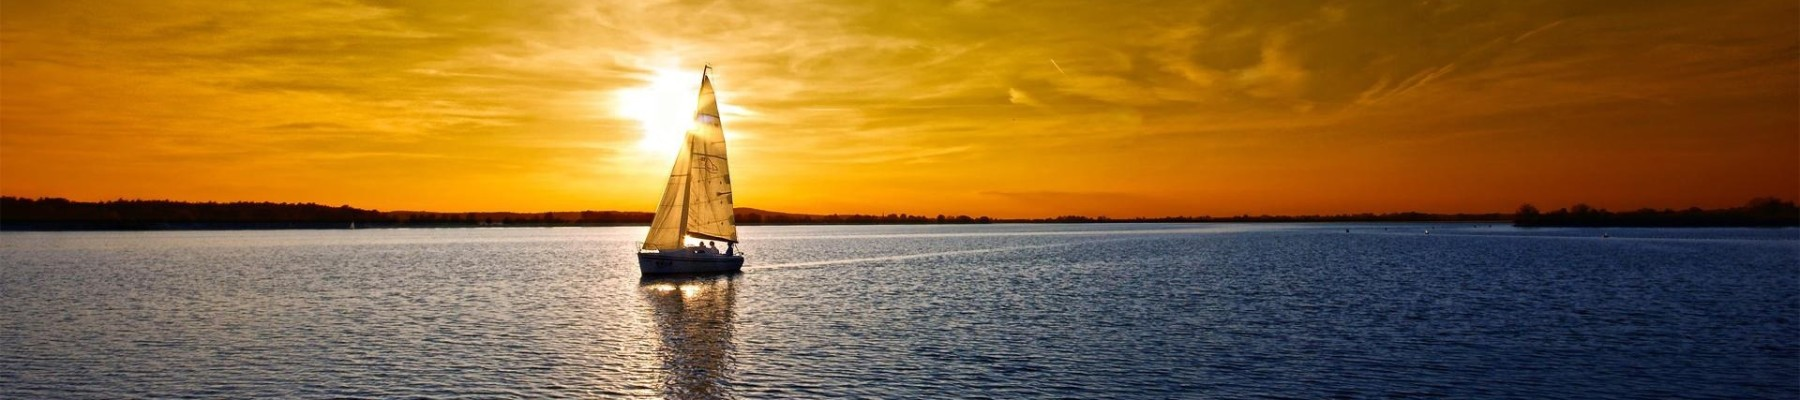 Sardinia Sail – Crociere a vela